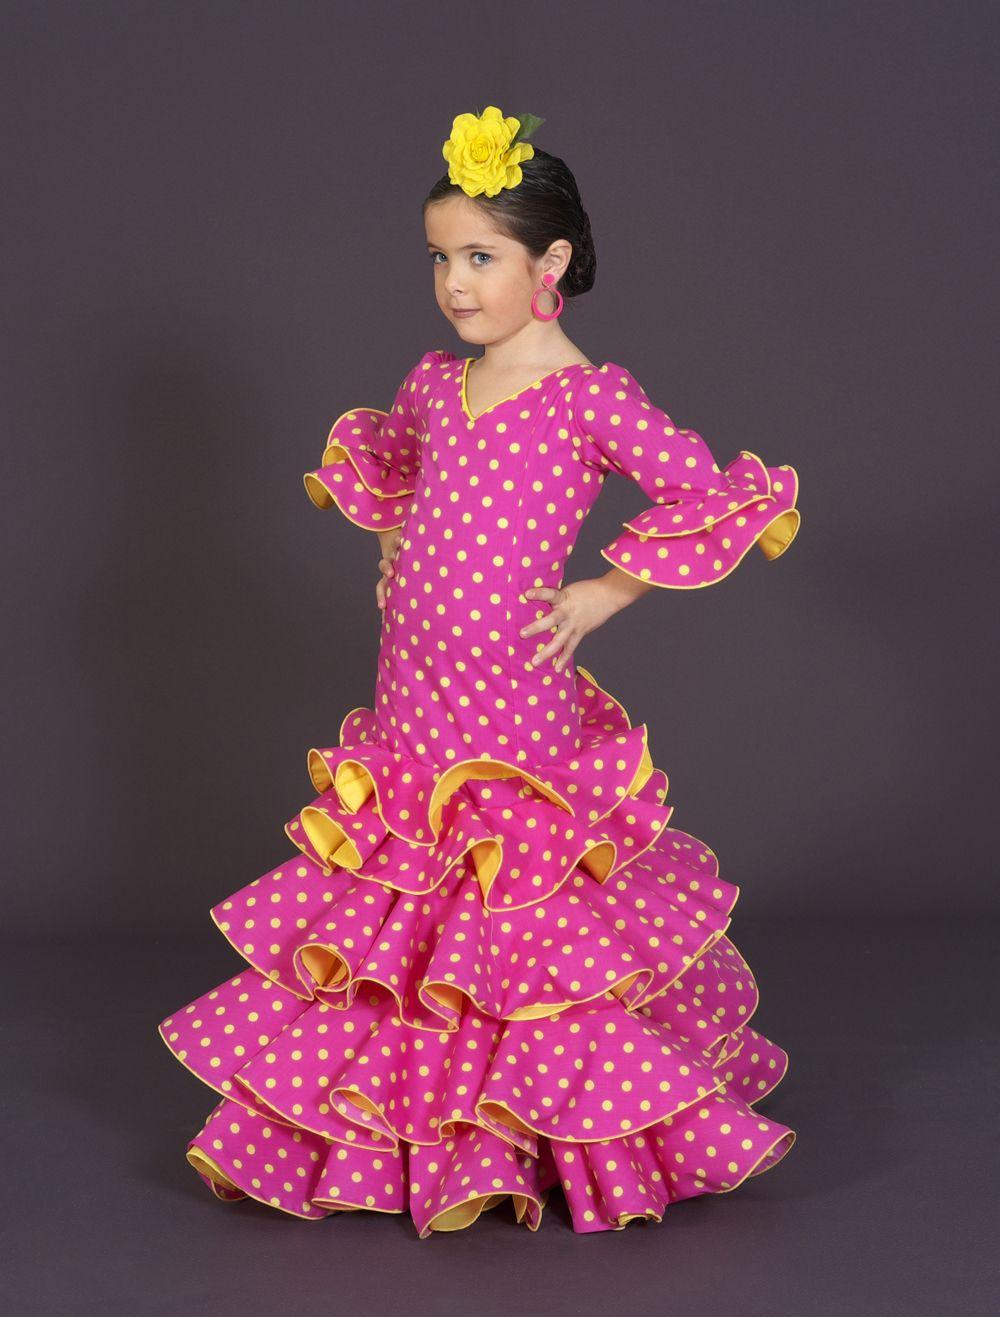 18d8ed30b2 Coleccion Moda Flamenca 2016 - Ana Barroso